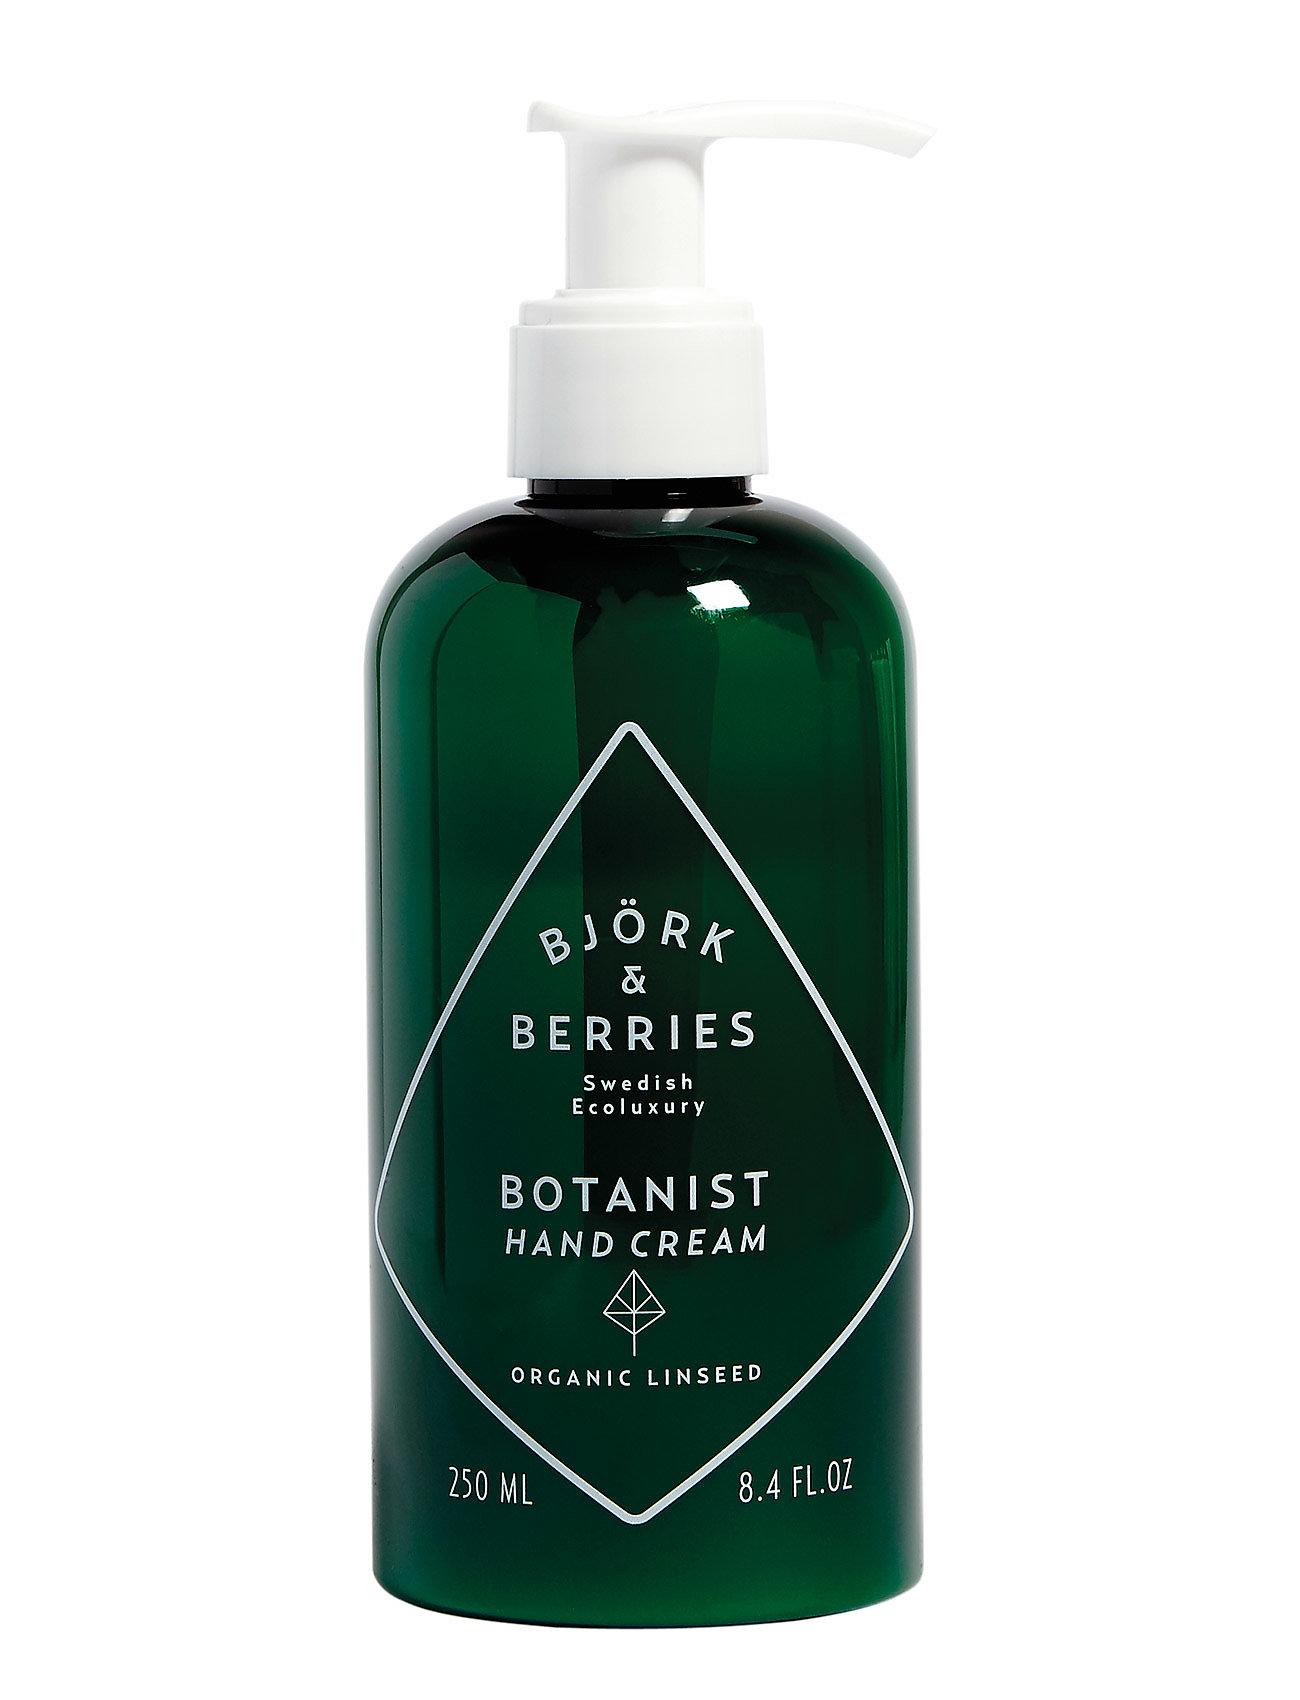 Image of Botanist Hand Cream Beauty WOMEN Skin Care Body Hand Cream & Foot Cream Nude Björk & Berries (3340172893)